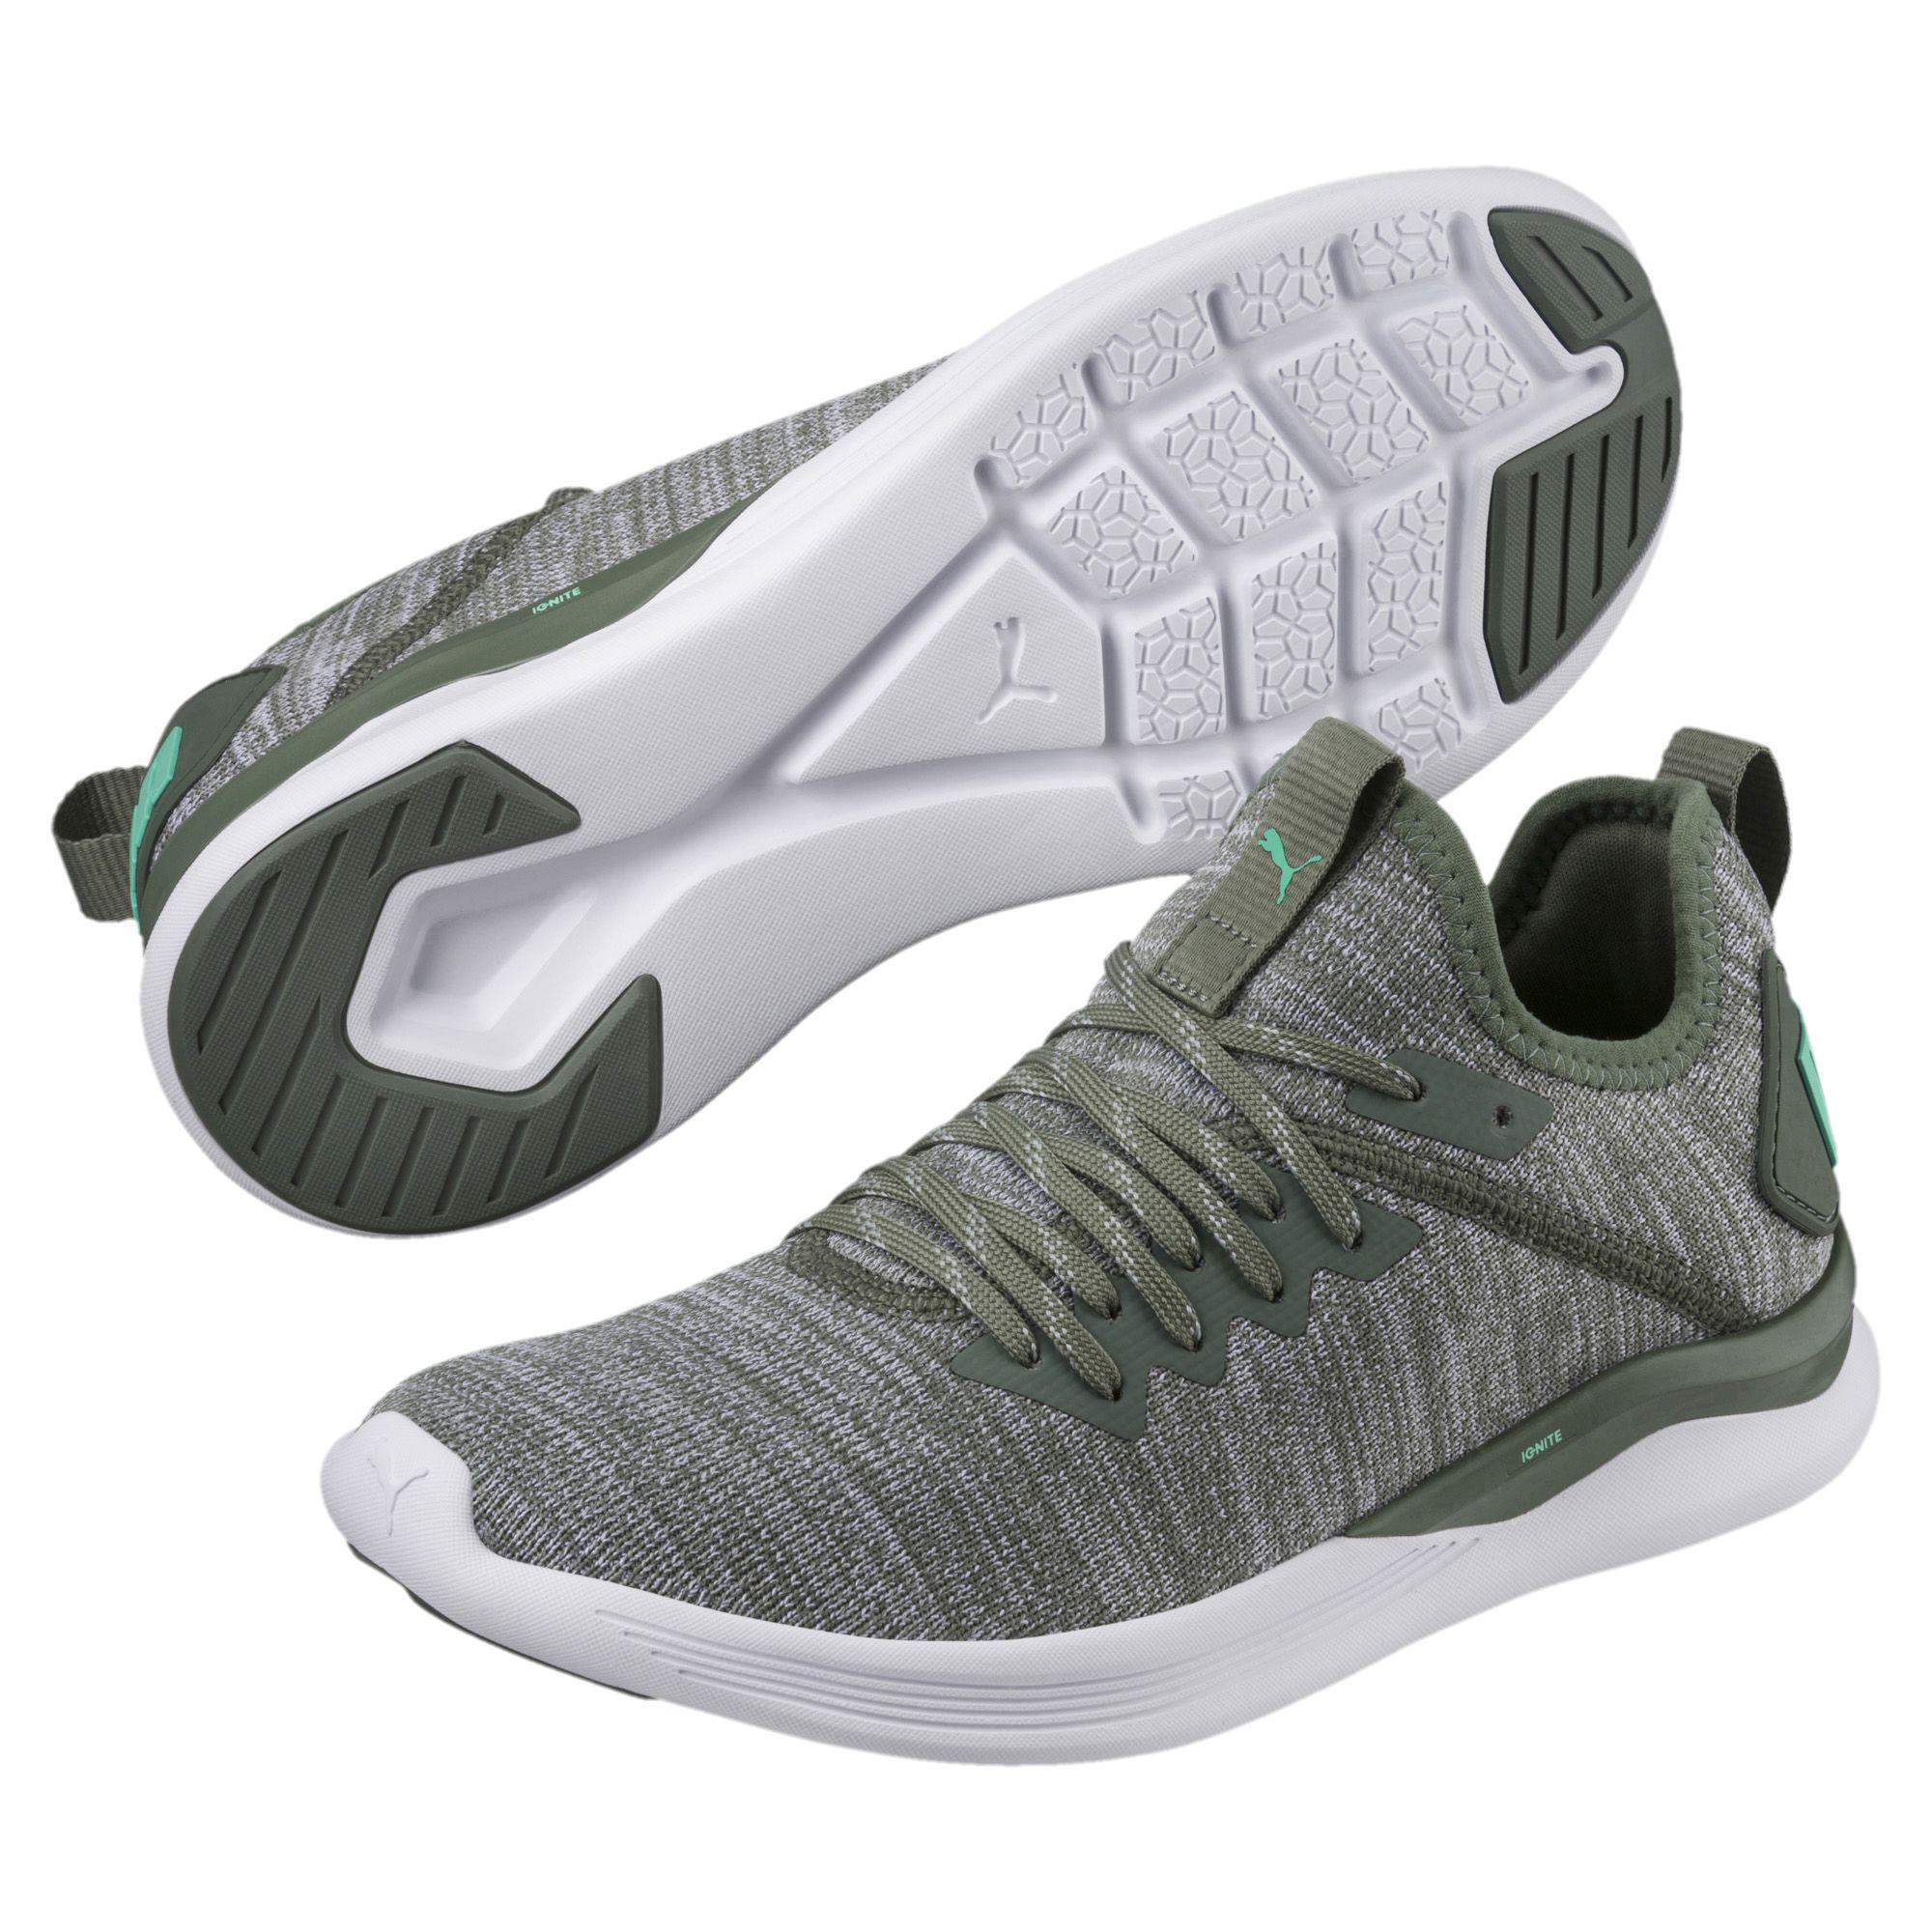 8e3e73040145c5 PUMA - Green Ignite Flash Evoknit Women s Training Shoes - Lyst. View  fullscreen